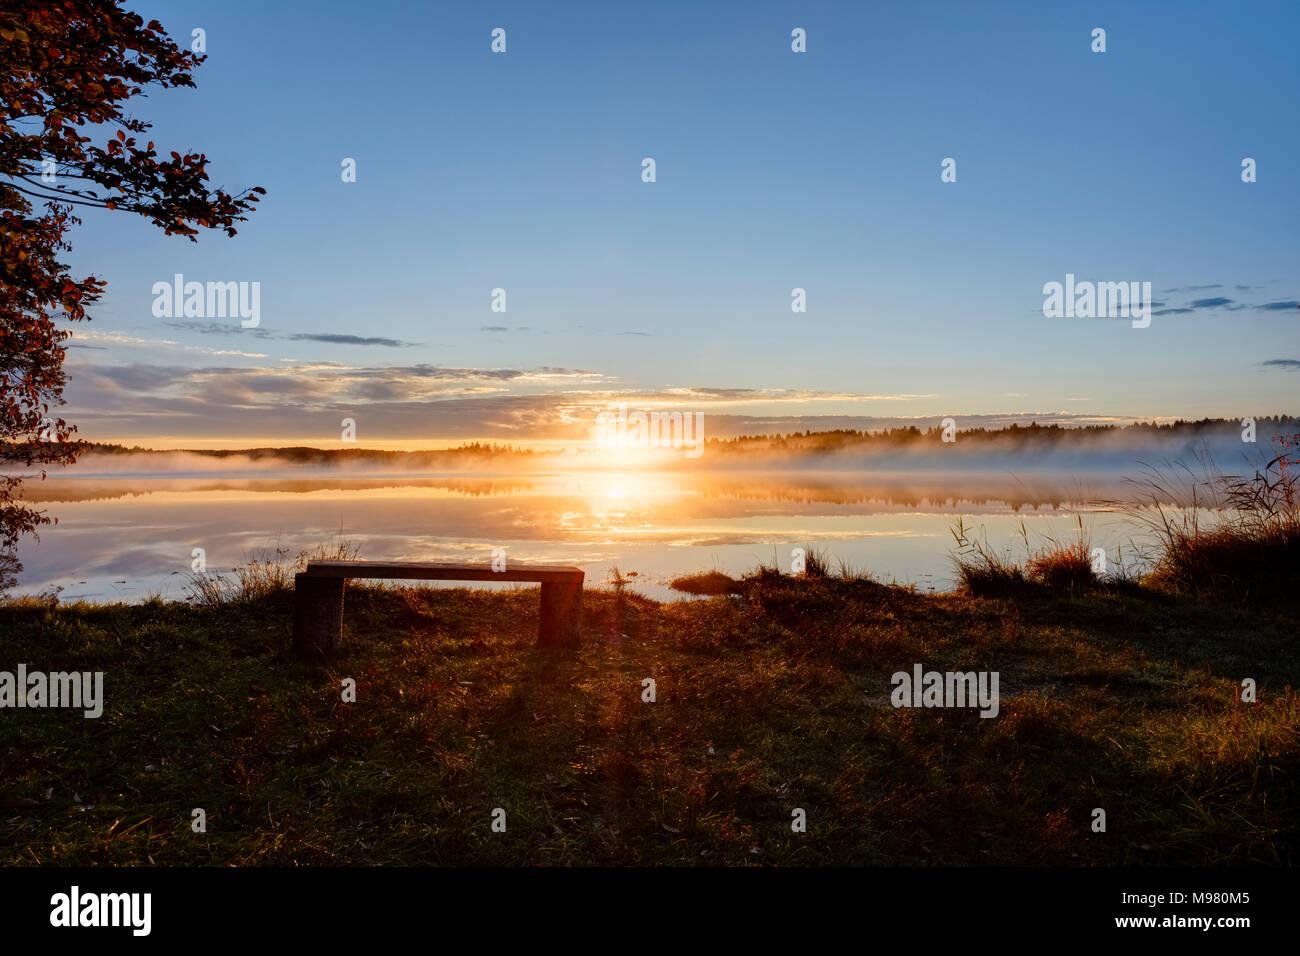 Sonnenaufgang, Kirchsee, bei Sachsenkam, Oberbayern, Bayern, Deutschland - Stock Image